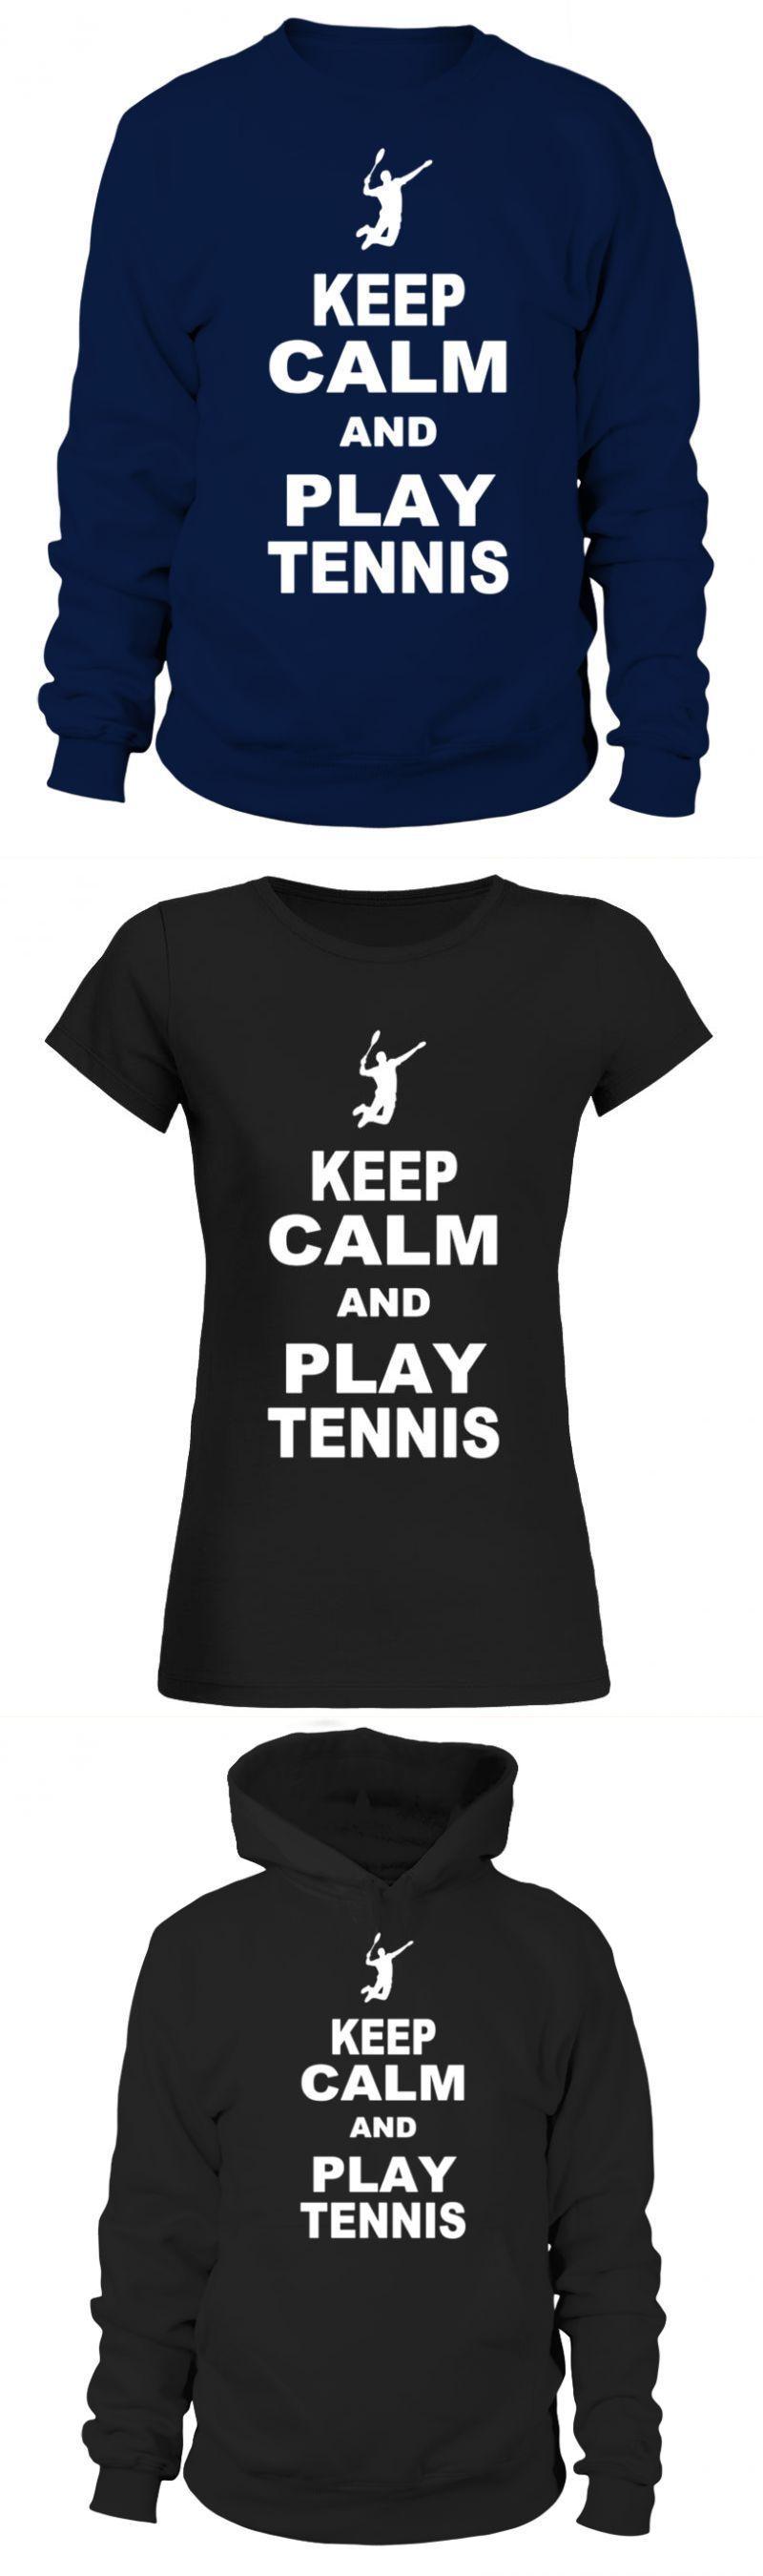 70b9bd04e1b T shirt tennis nike junior tennis ball sports tennis player tshirt women's  tennis t shirt #shirt #tennis #nike #junior #ball #sports #player #tshirt  ...